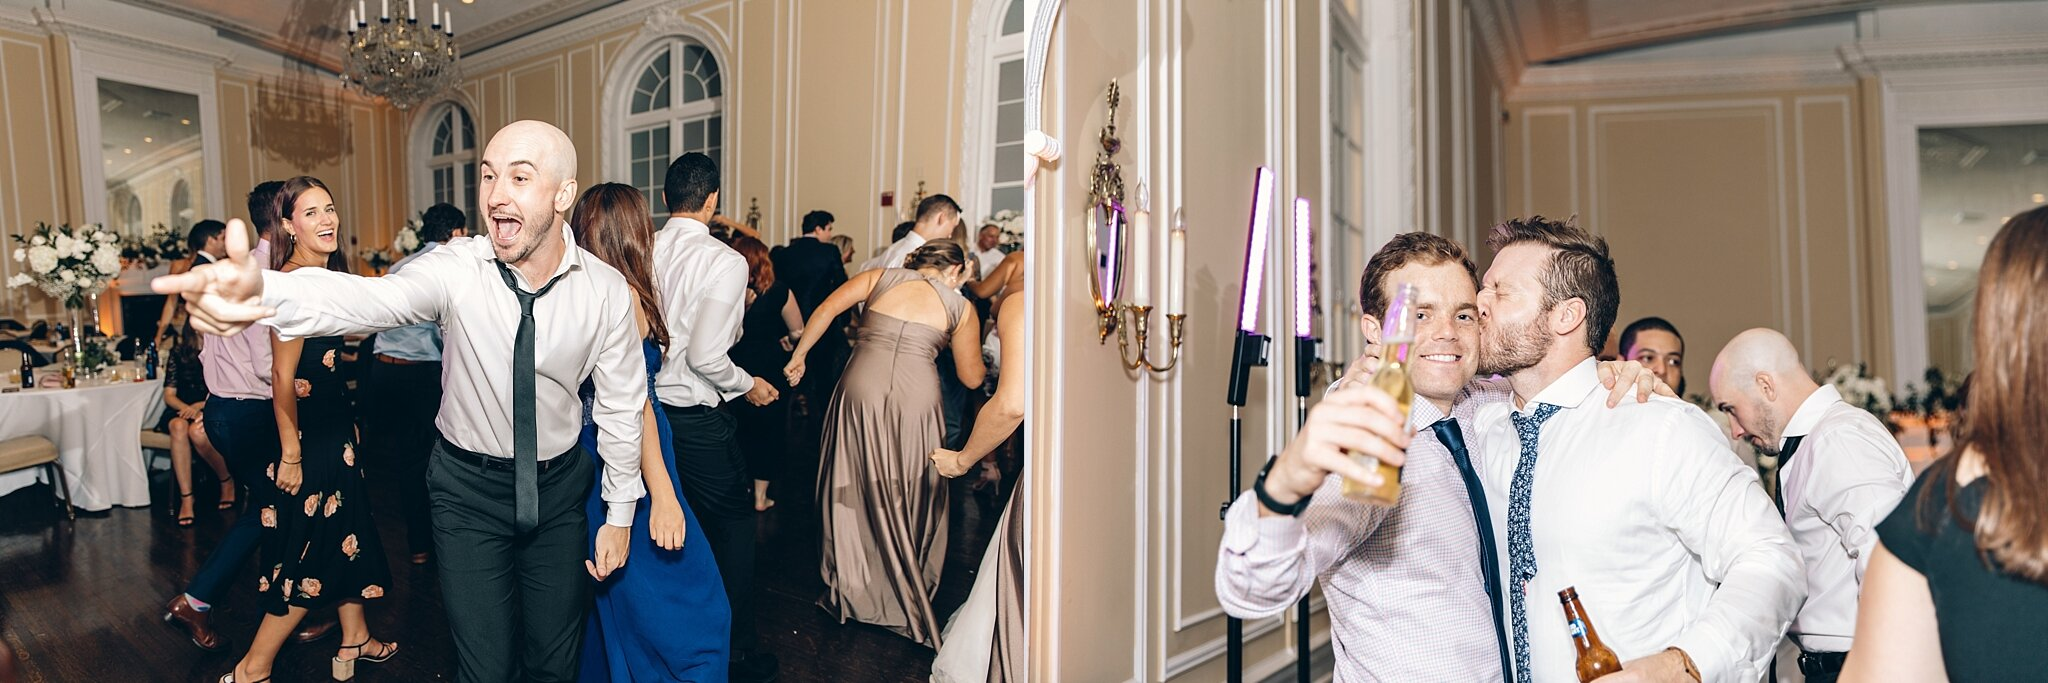 patrick-henry-ballroom-wedding-roanoke_0568.jpg